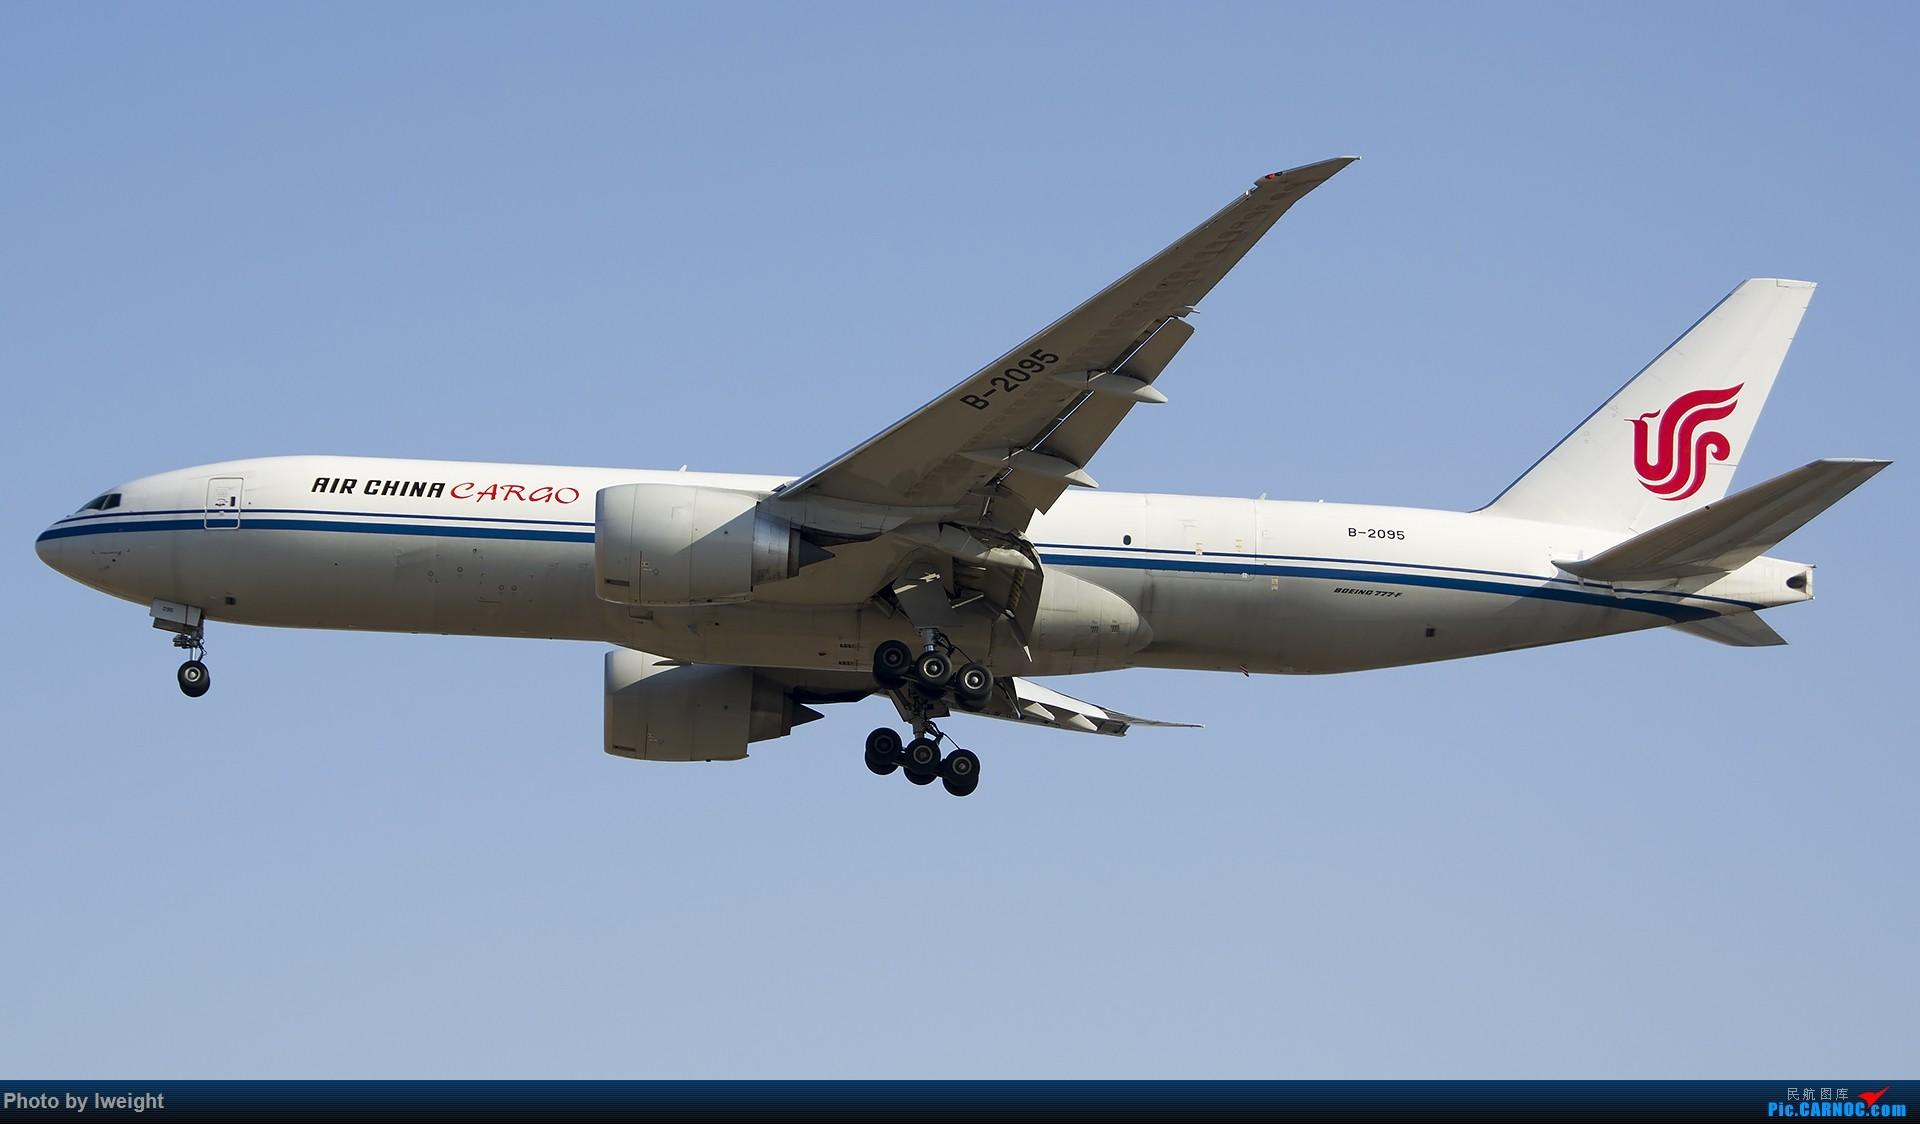 Re:[原创]庆祝升级777,发上今天在首都机场拍的所有飞机【2014-12-14】 BOEING 777-200 B-2095 中国北京首都国际机场